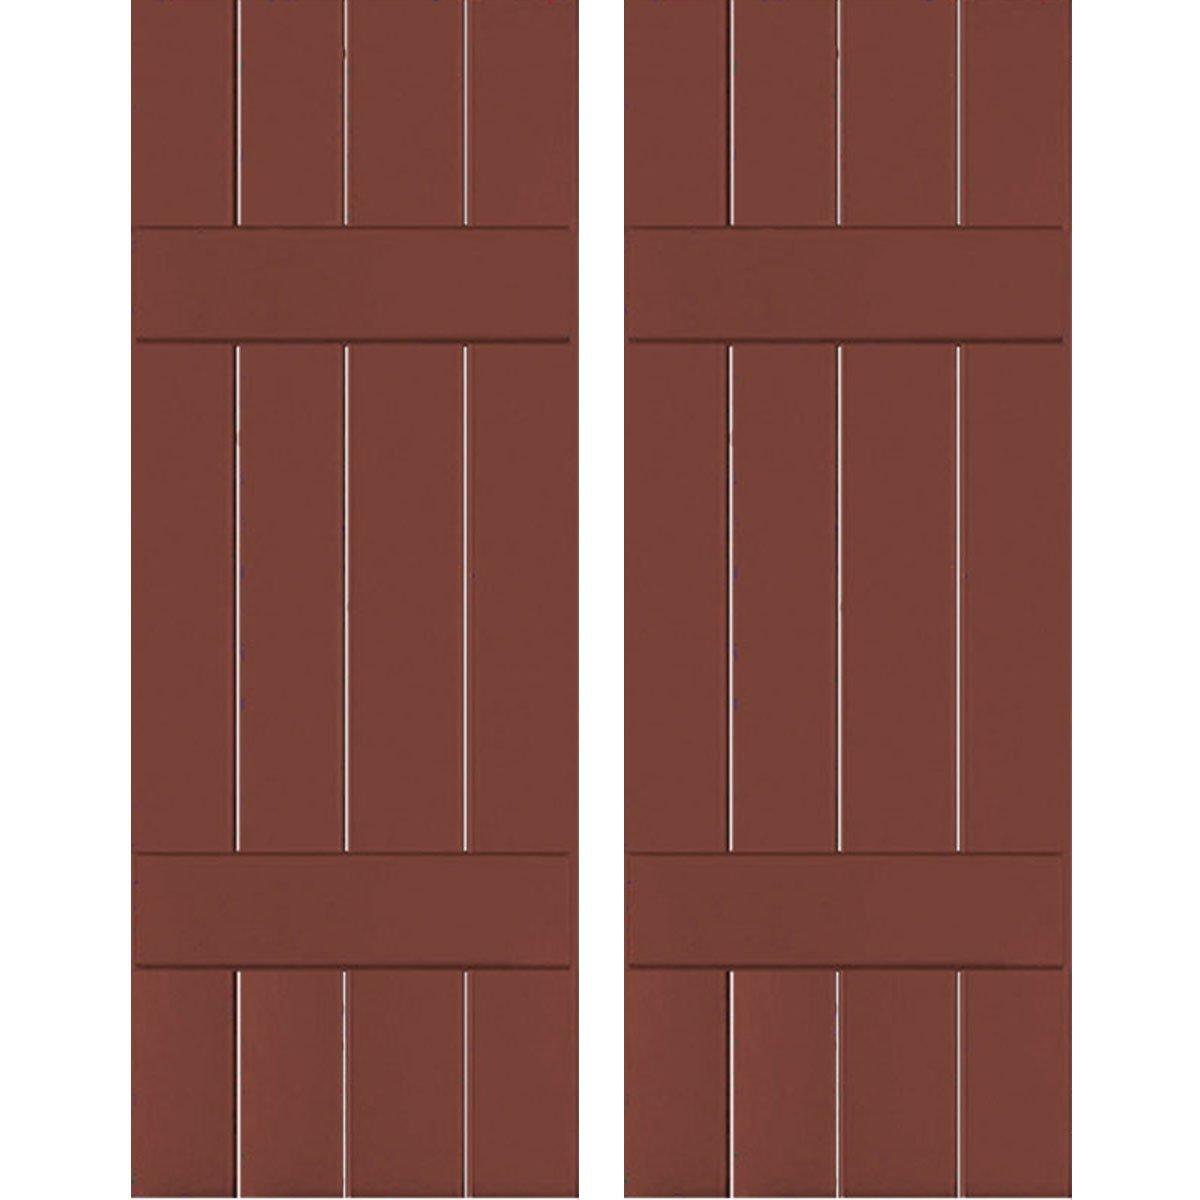 Ekena Millwork RWB15X030RWP Exterior Four Board